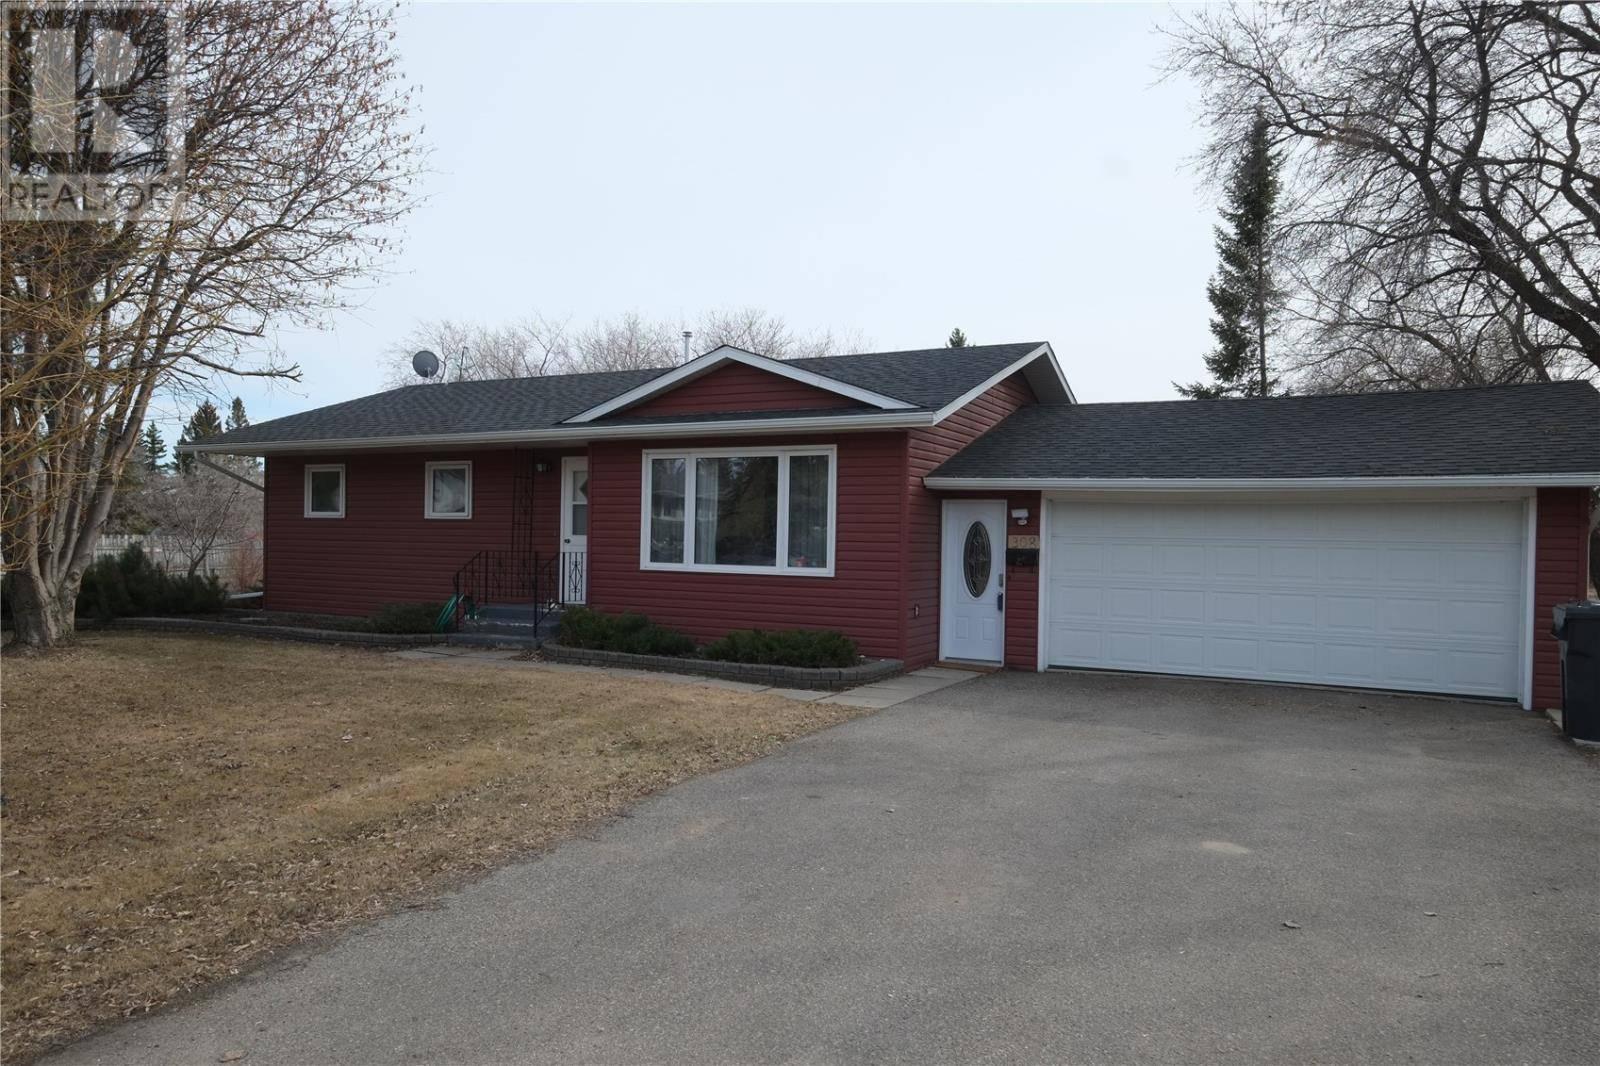 House for sale at 308 2nd St S Waldheim Saskatchewan - MLS: SK767670